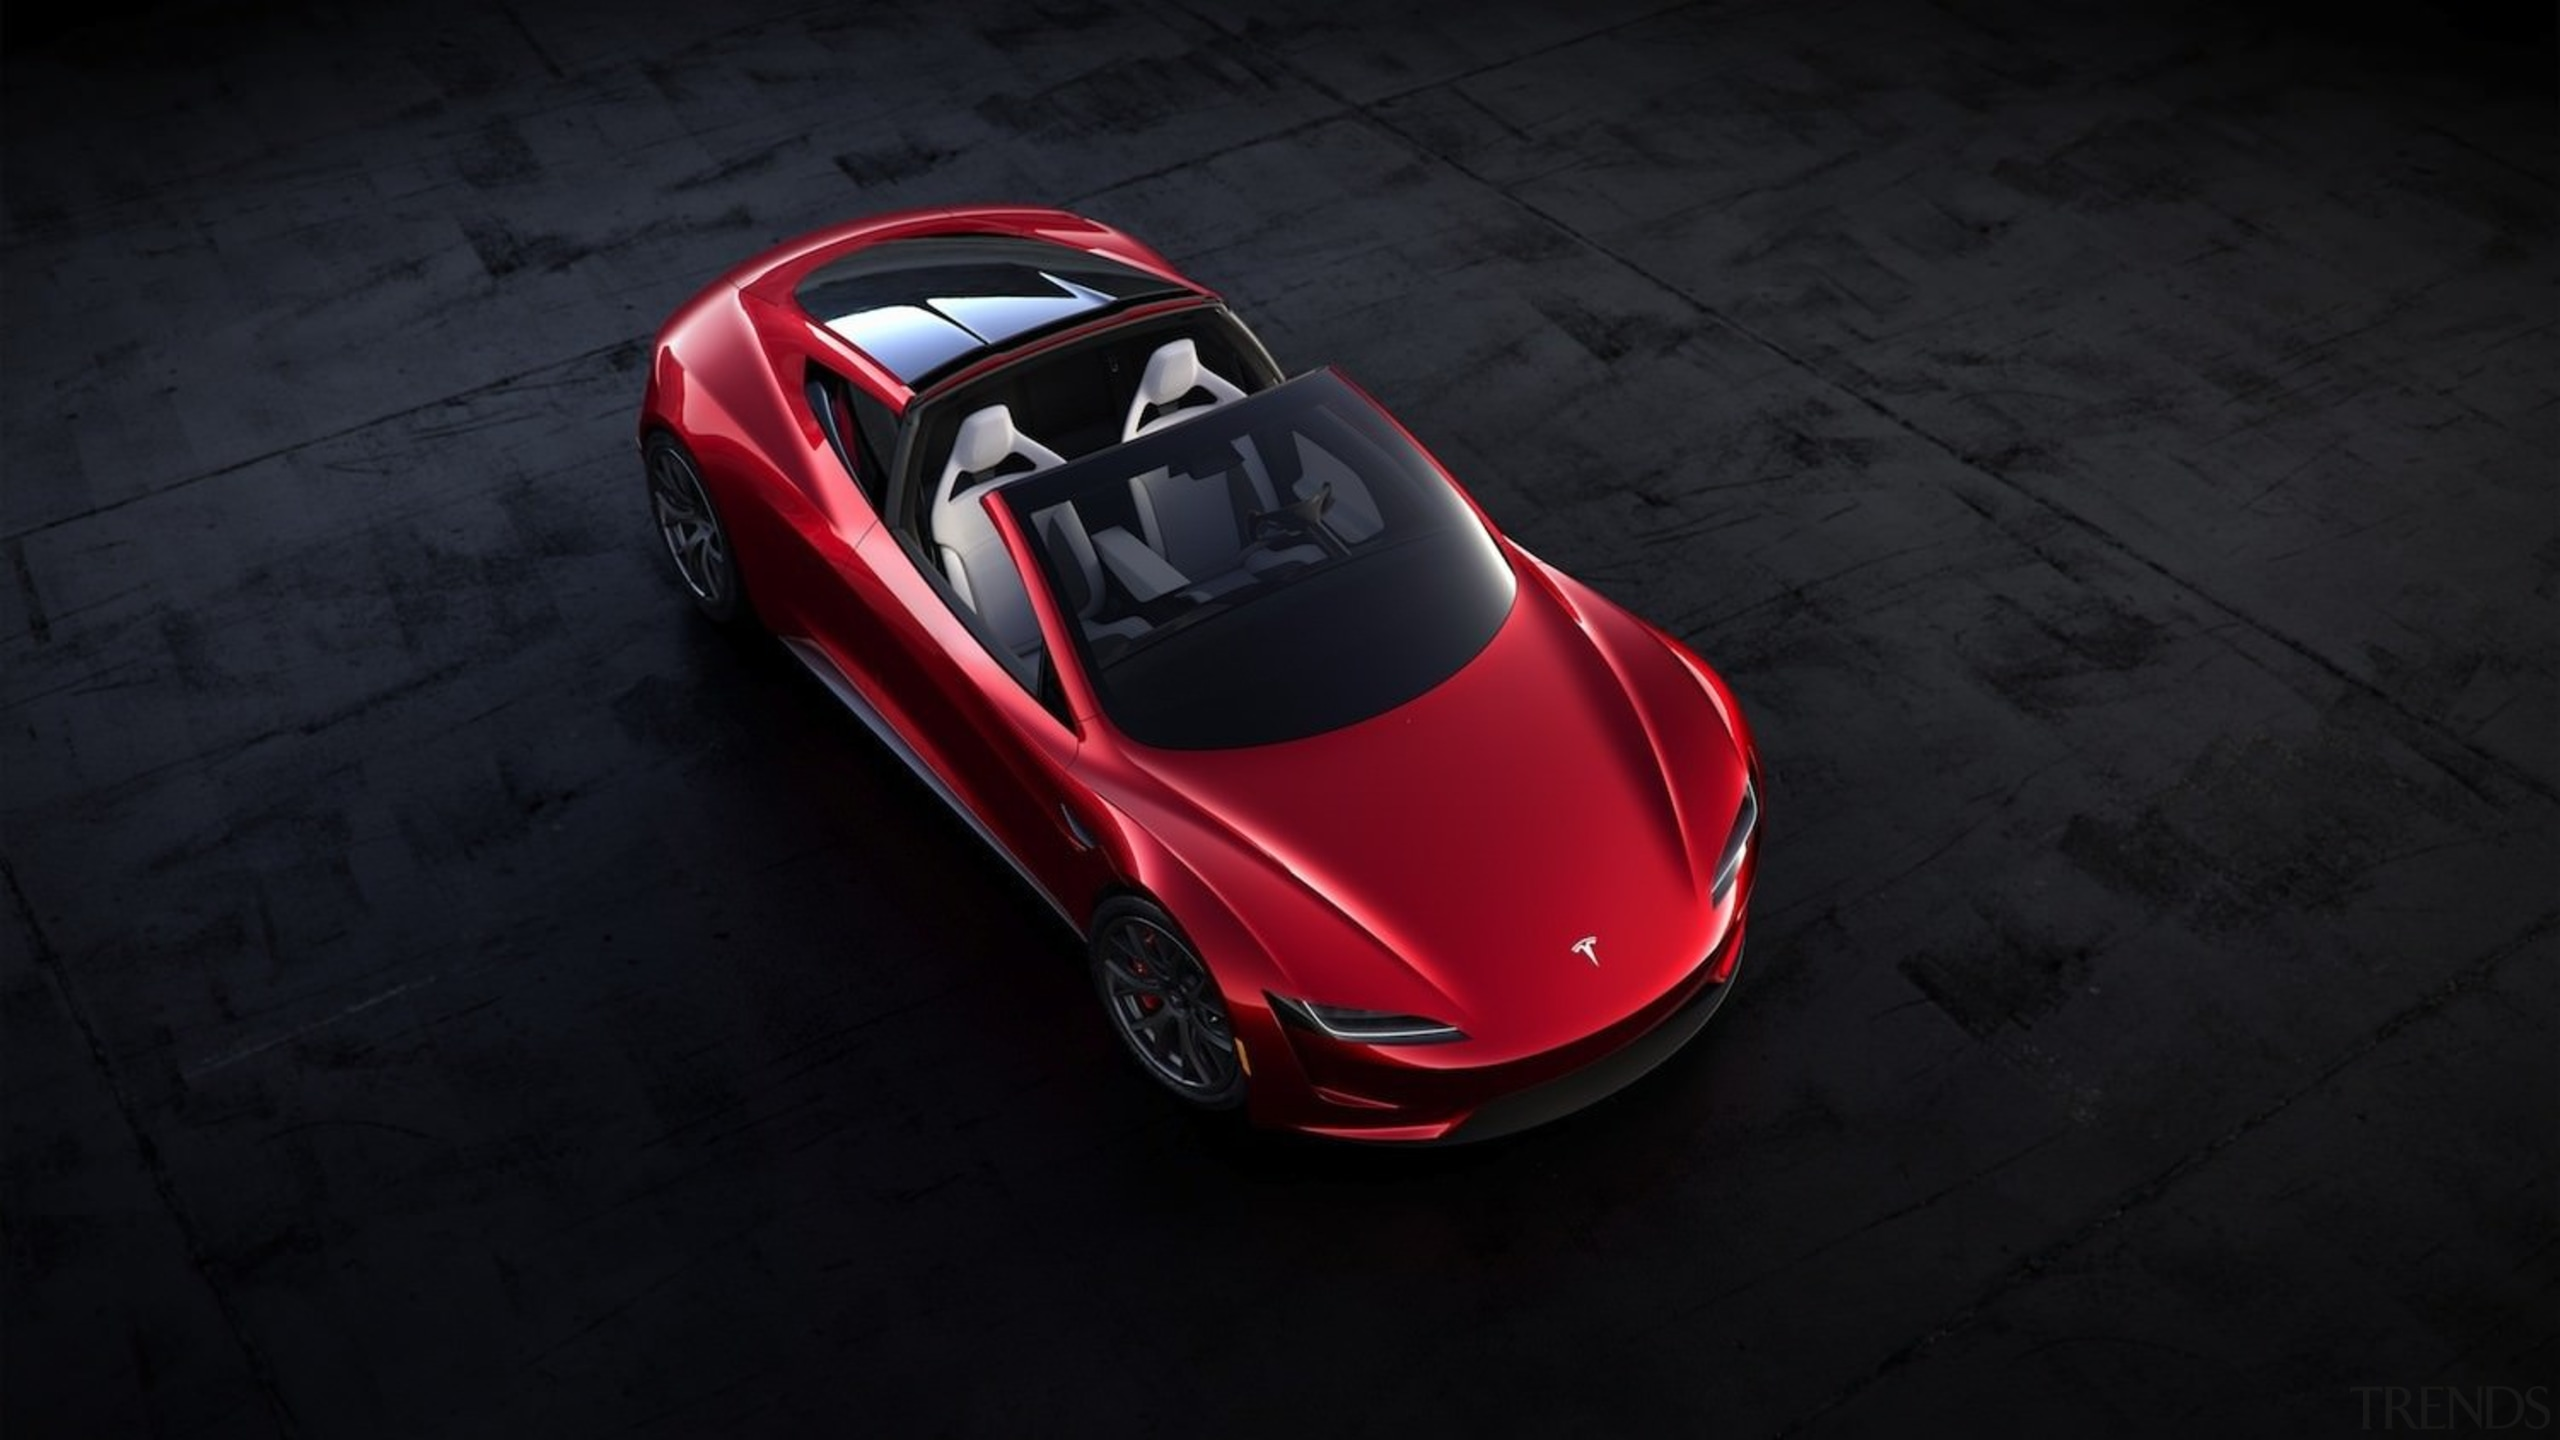 Tesla's new Roadster - Tesla's new Roadster - automotive design, car, computer wallpaper, land vehicle, luxury vehicle, mode of transport, motor vehicle, performance car, race car, sports car, supercar, vehicle, black